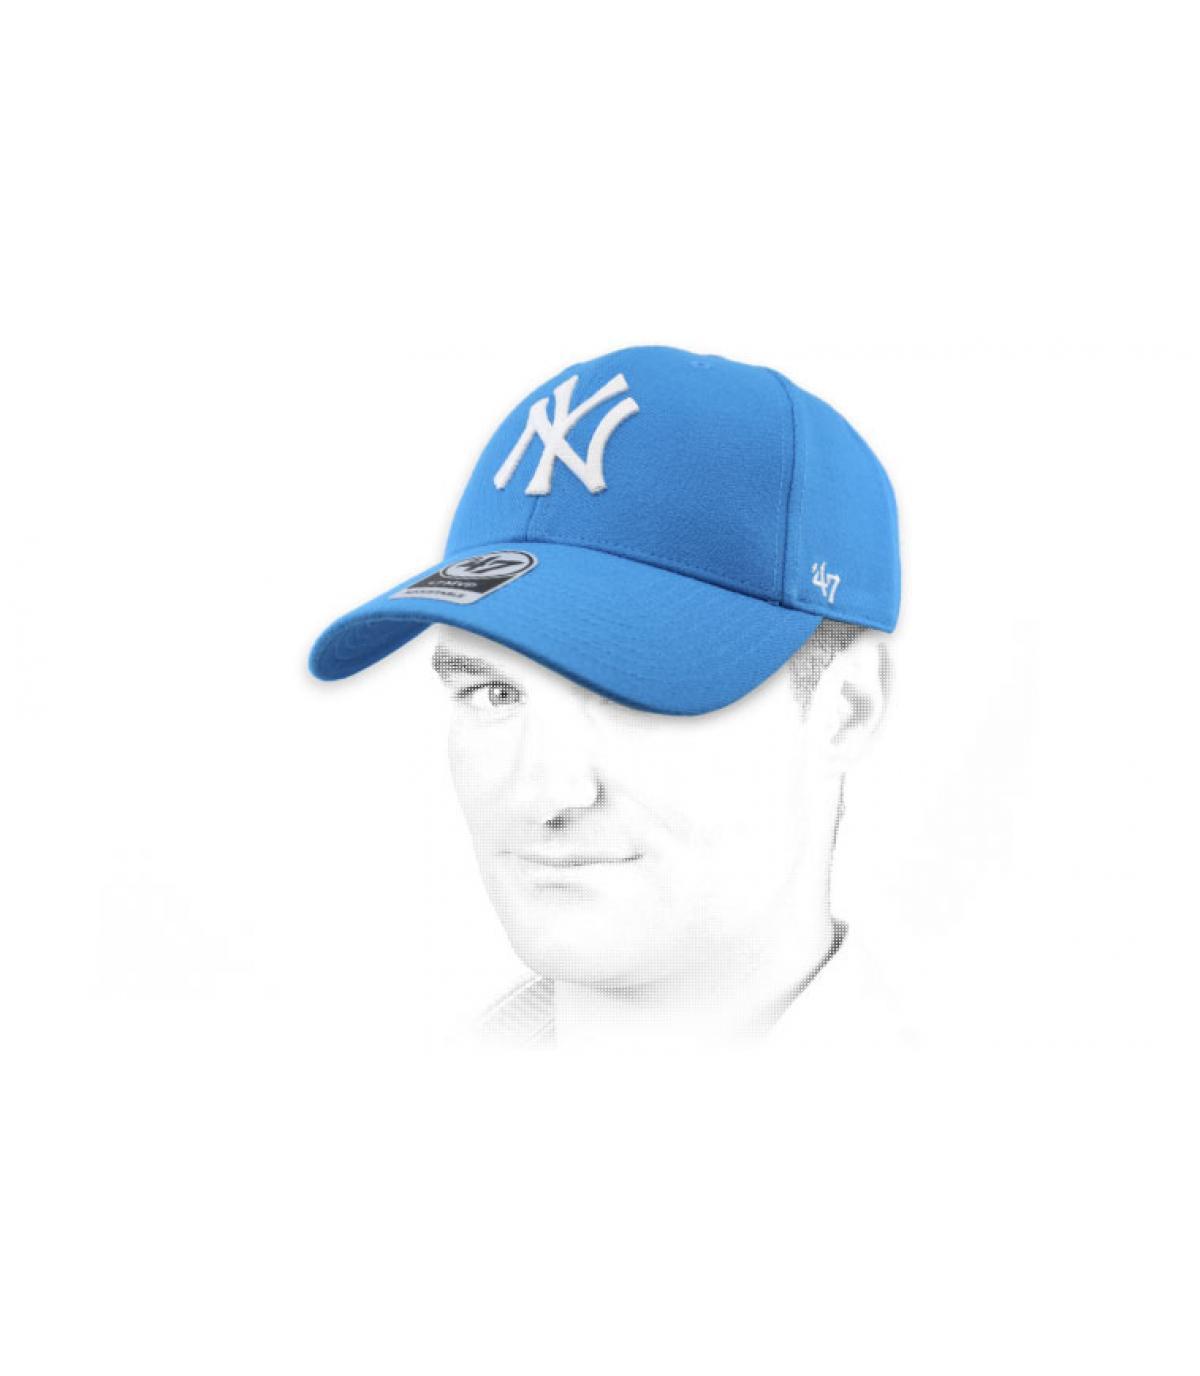 Cap NY türkis47